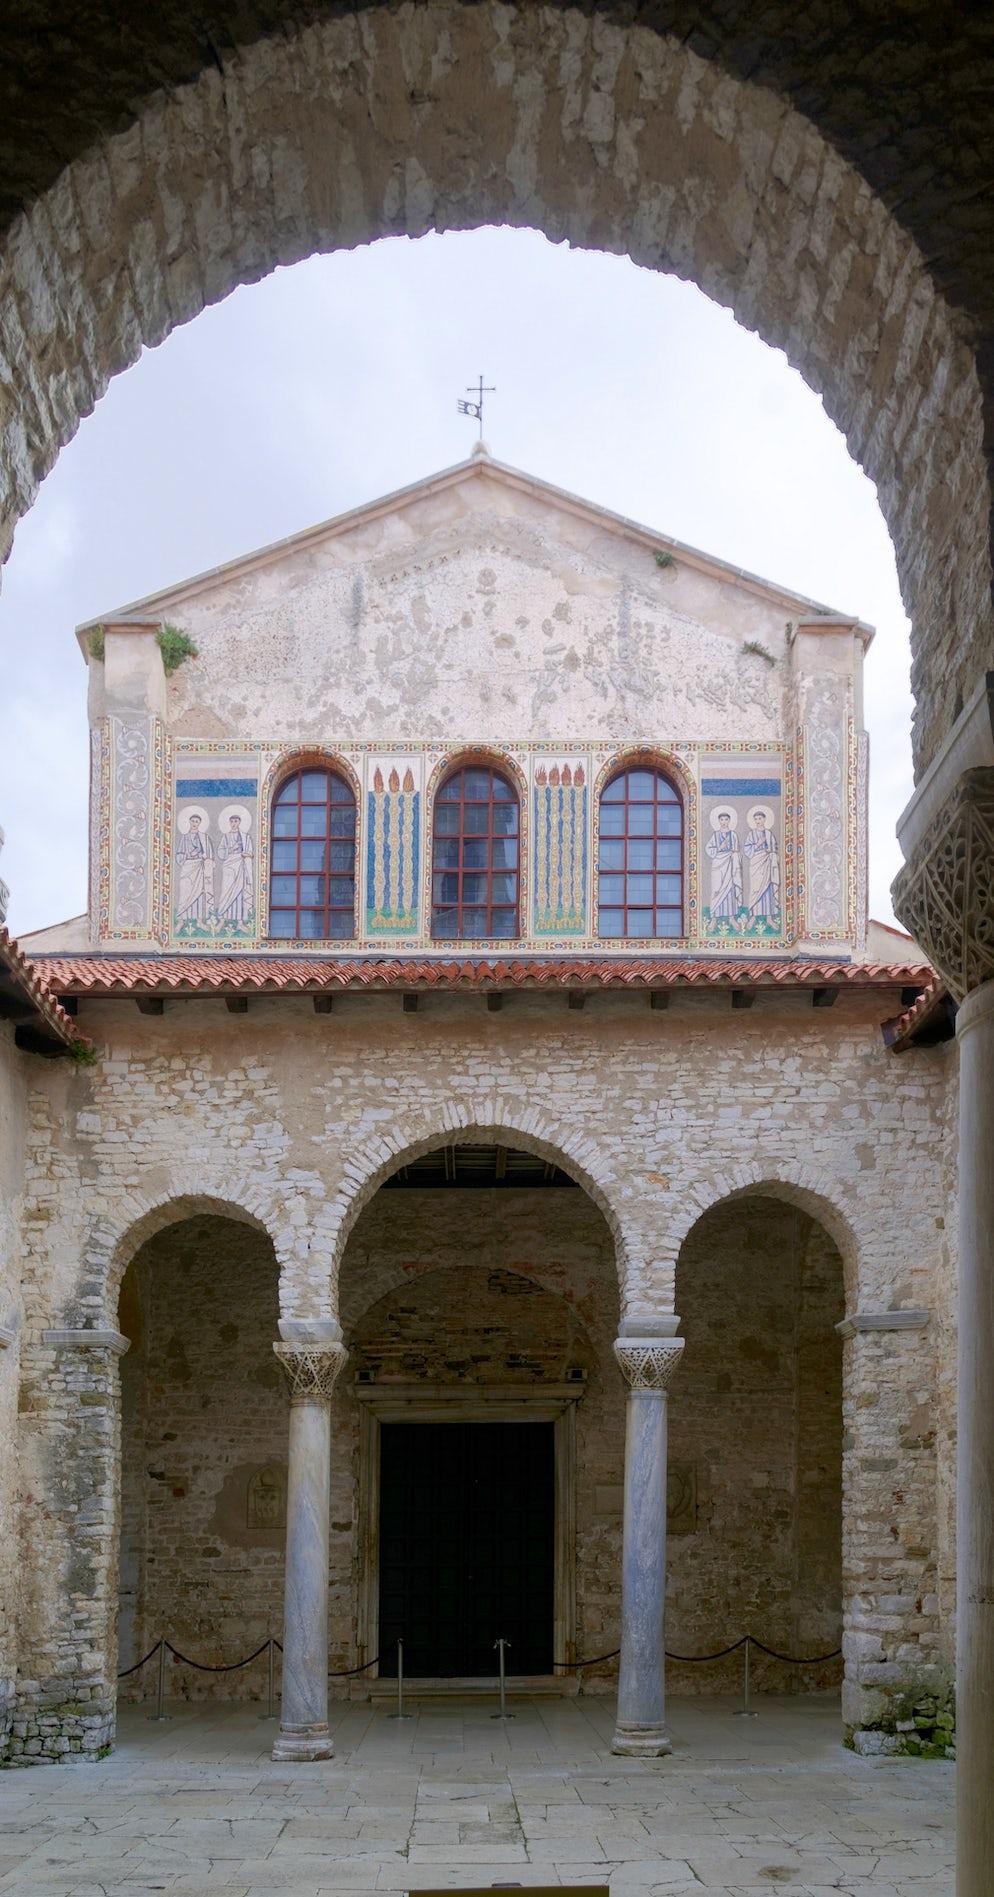 Euphrasian Basilica; Photo © credits: Berthold Werner